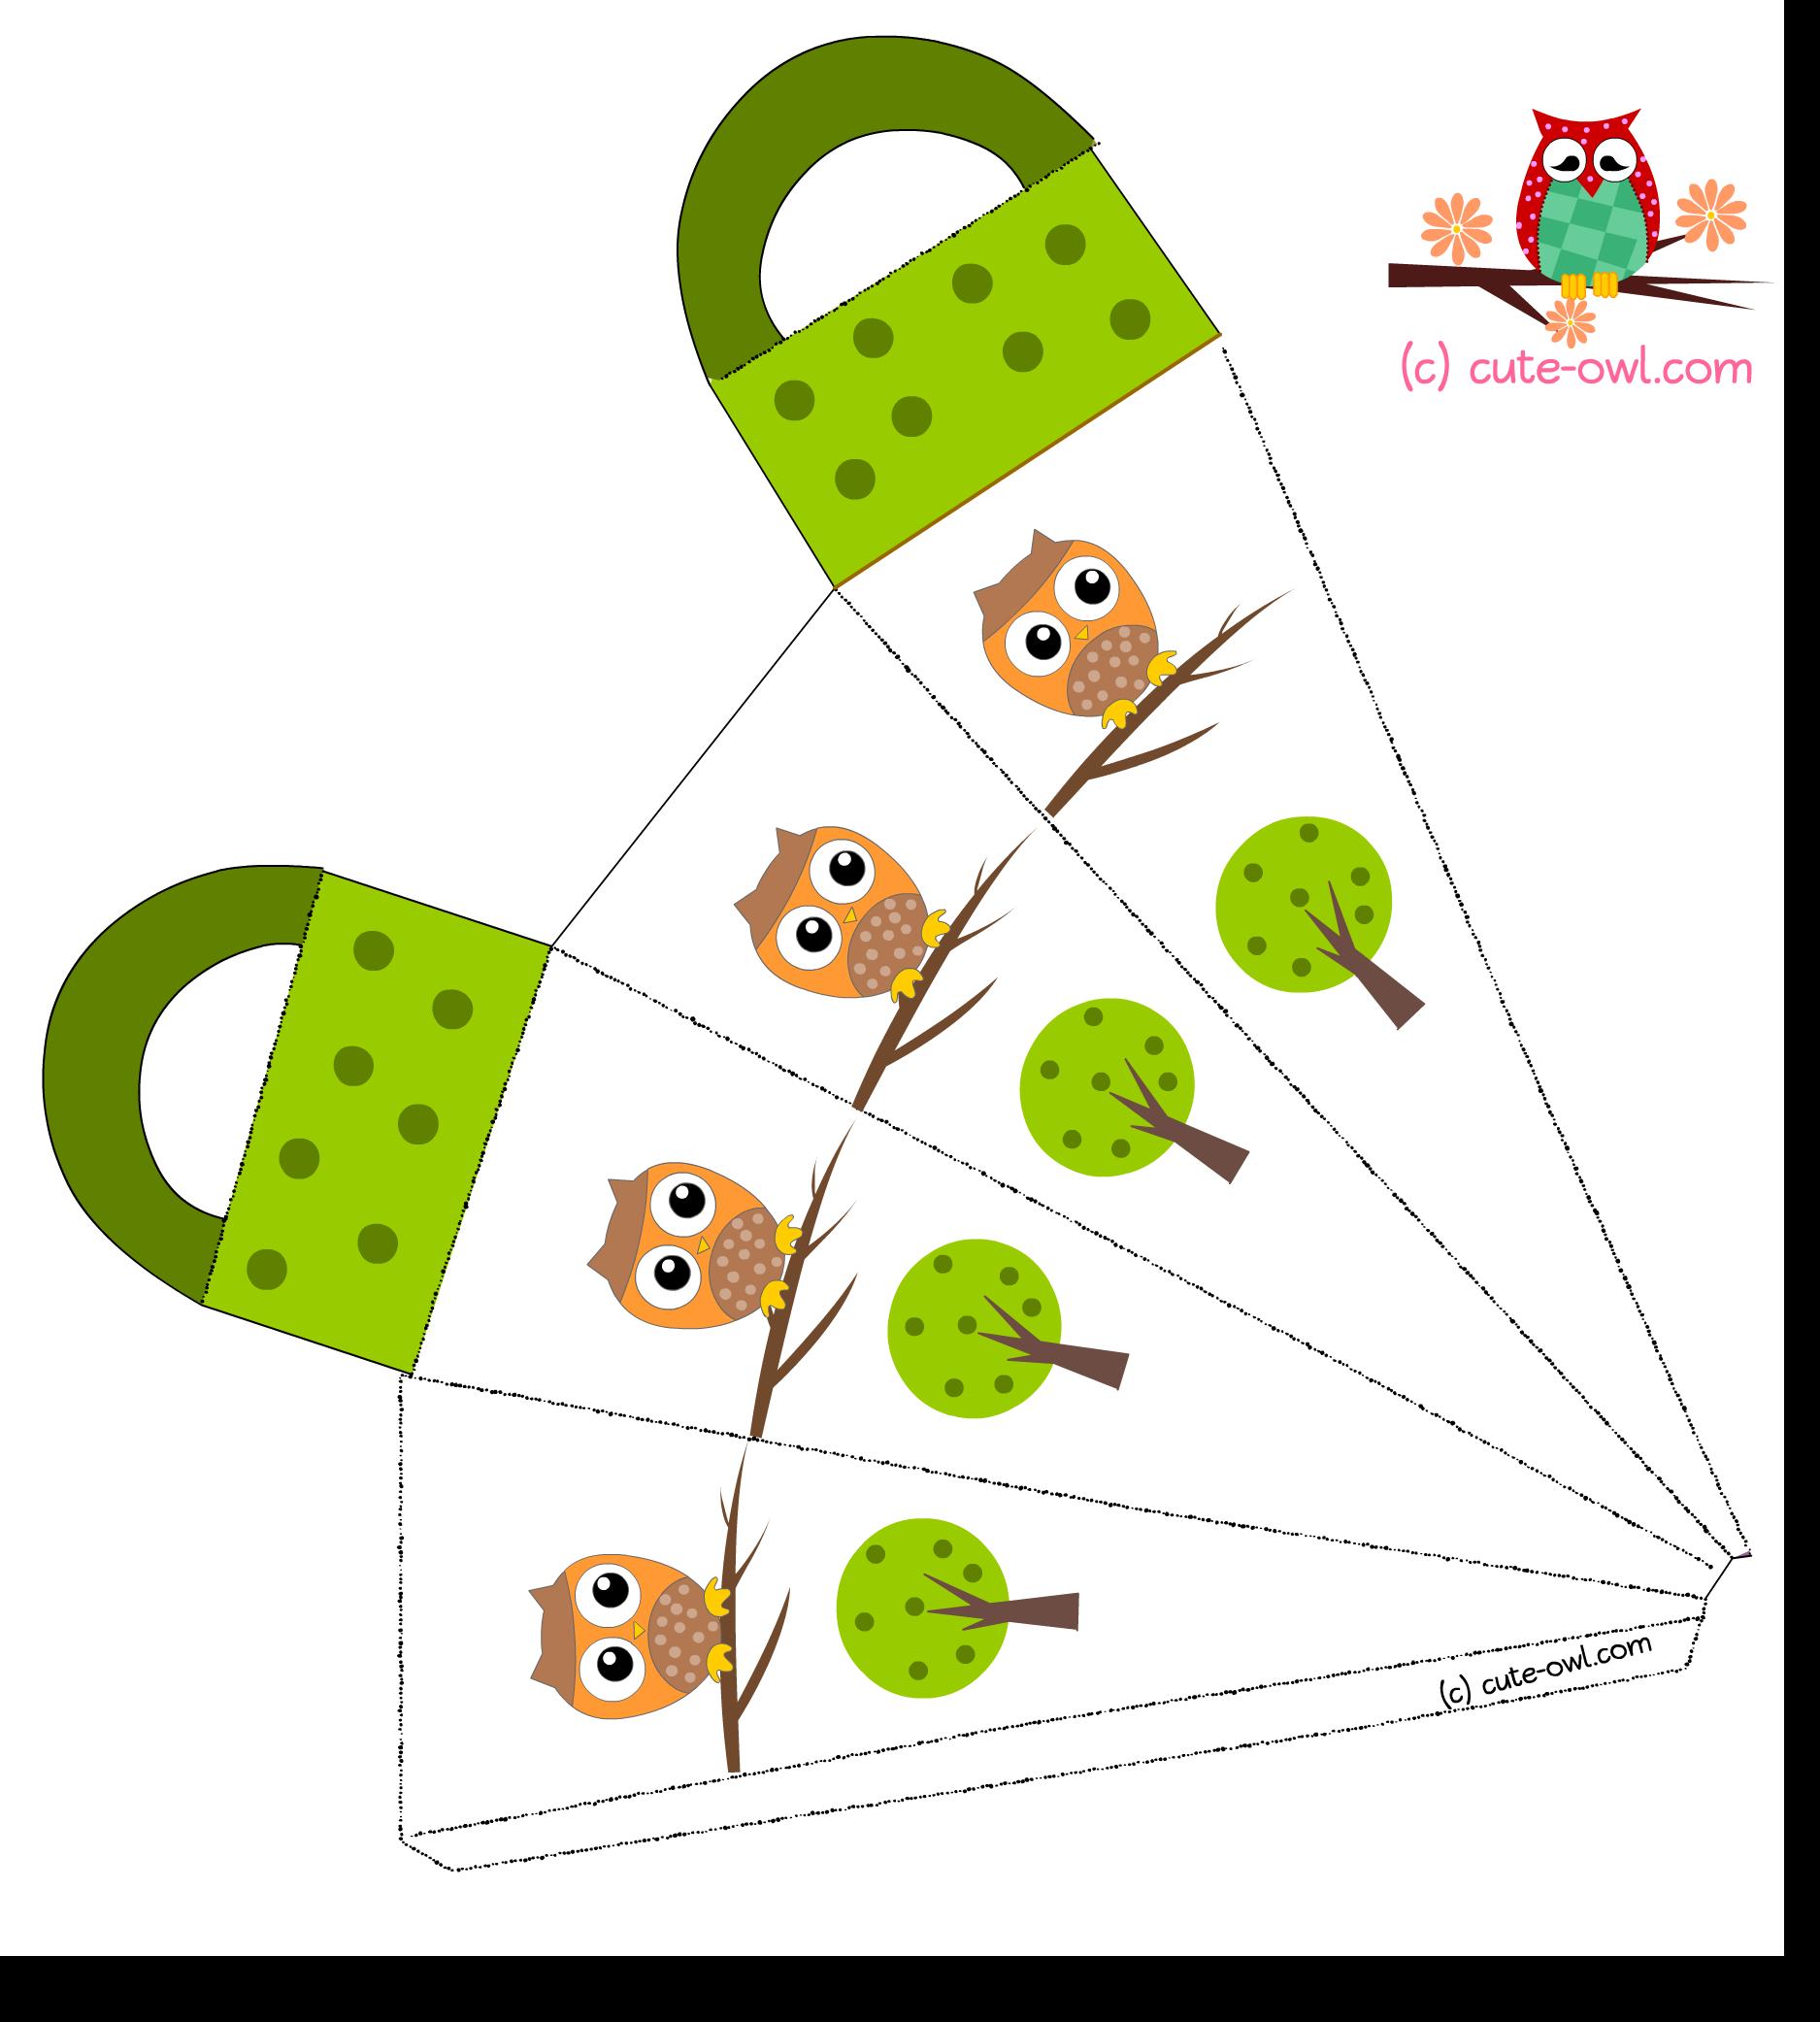 http://cute-owl.com/owl-party-favor-bags/owl-party-favor ...